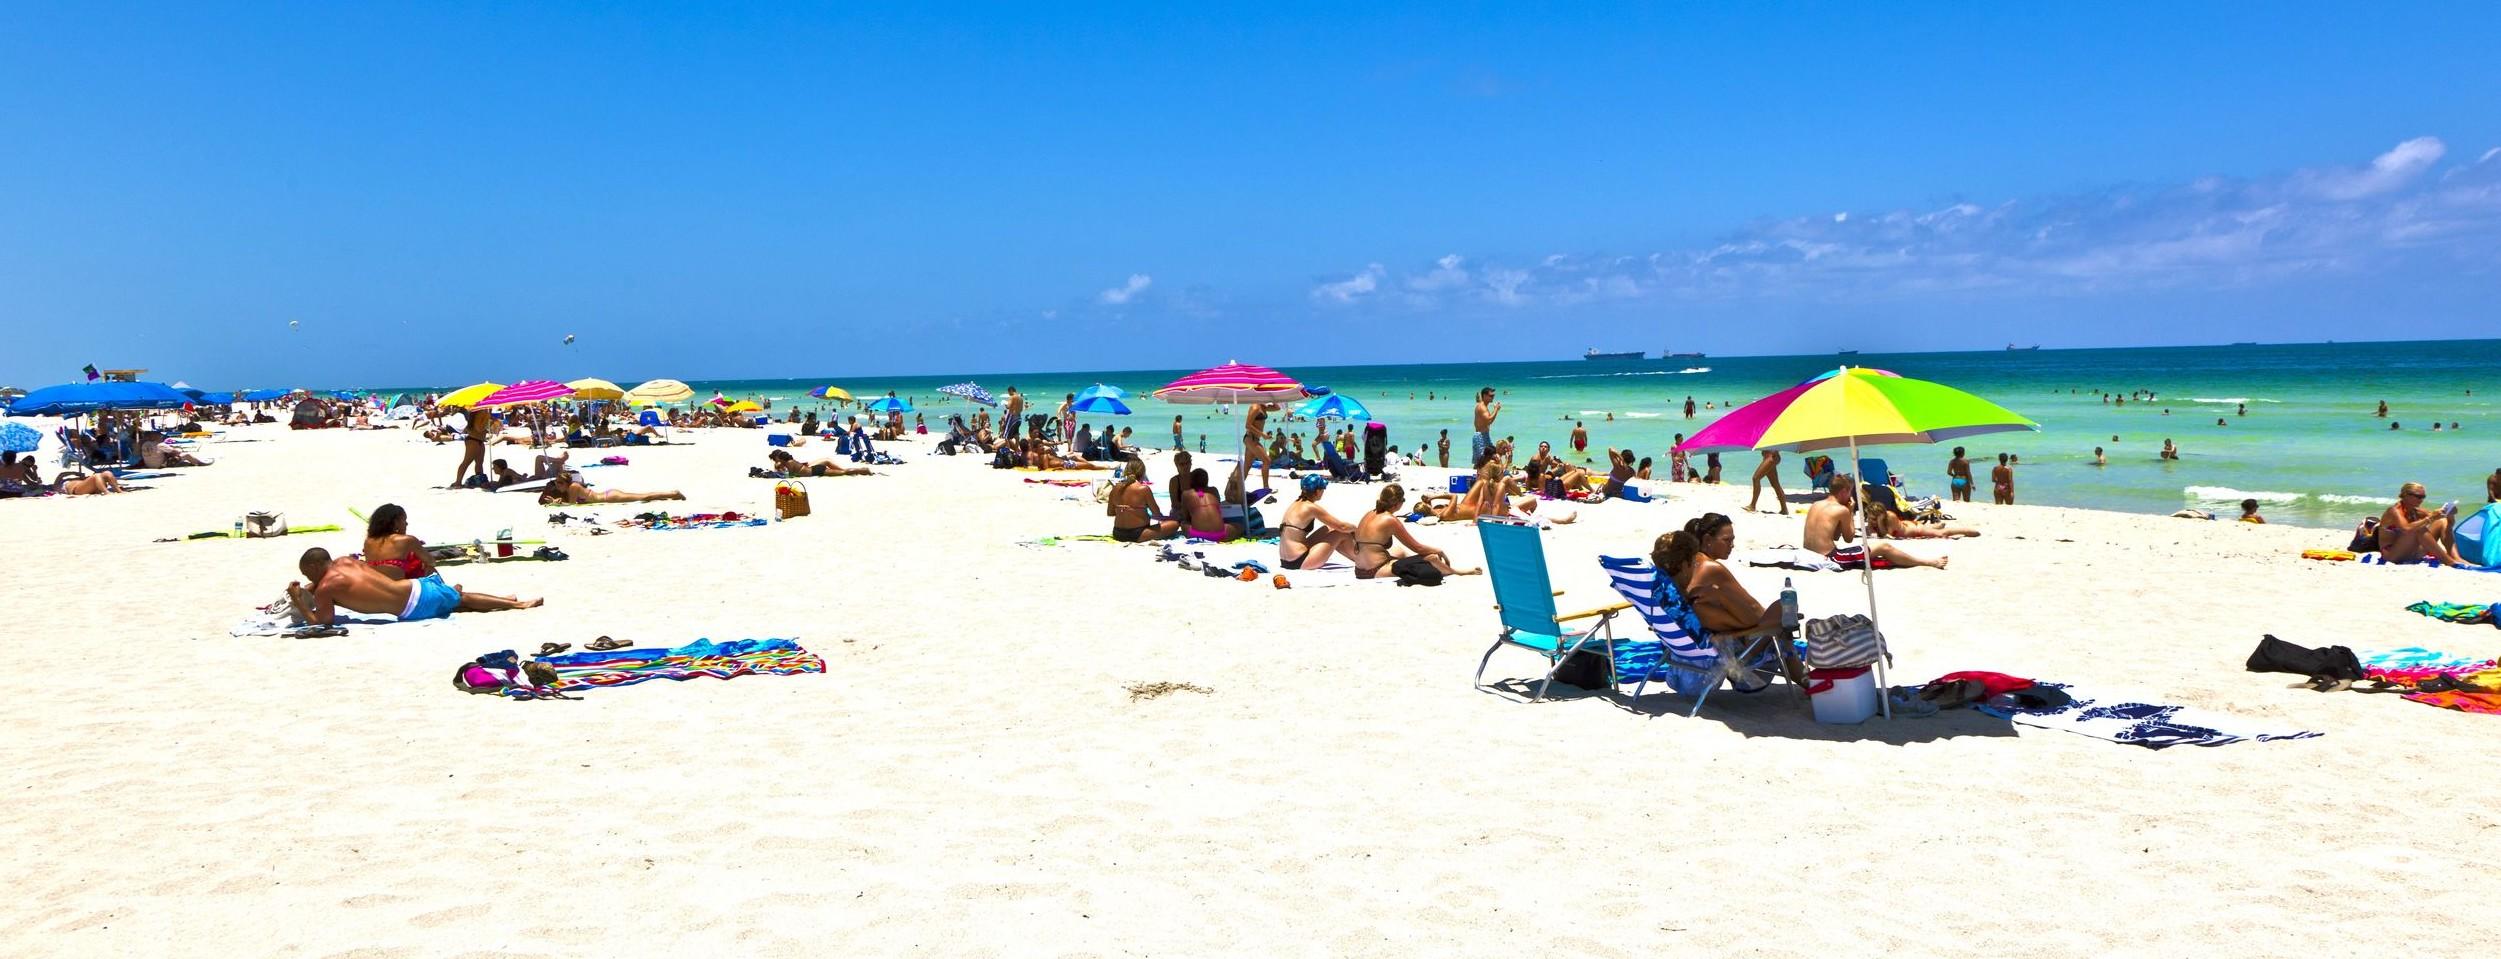 Miami Beach with umbrellas